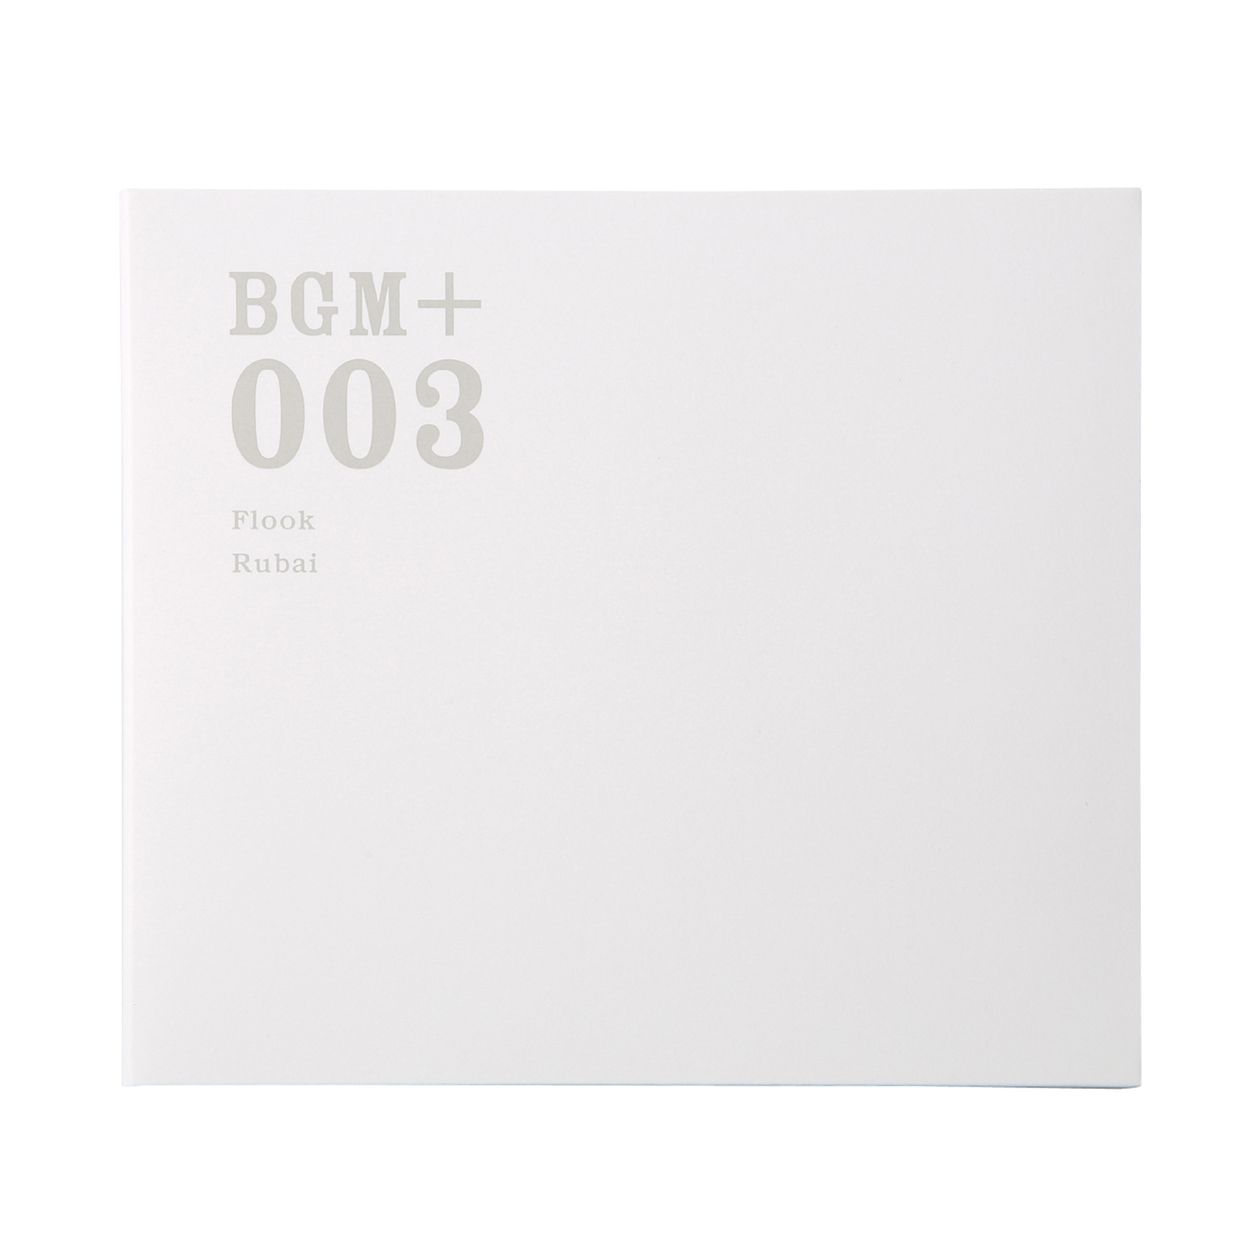 BGM+003